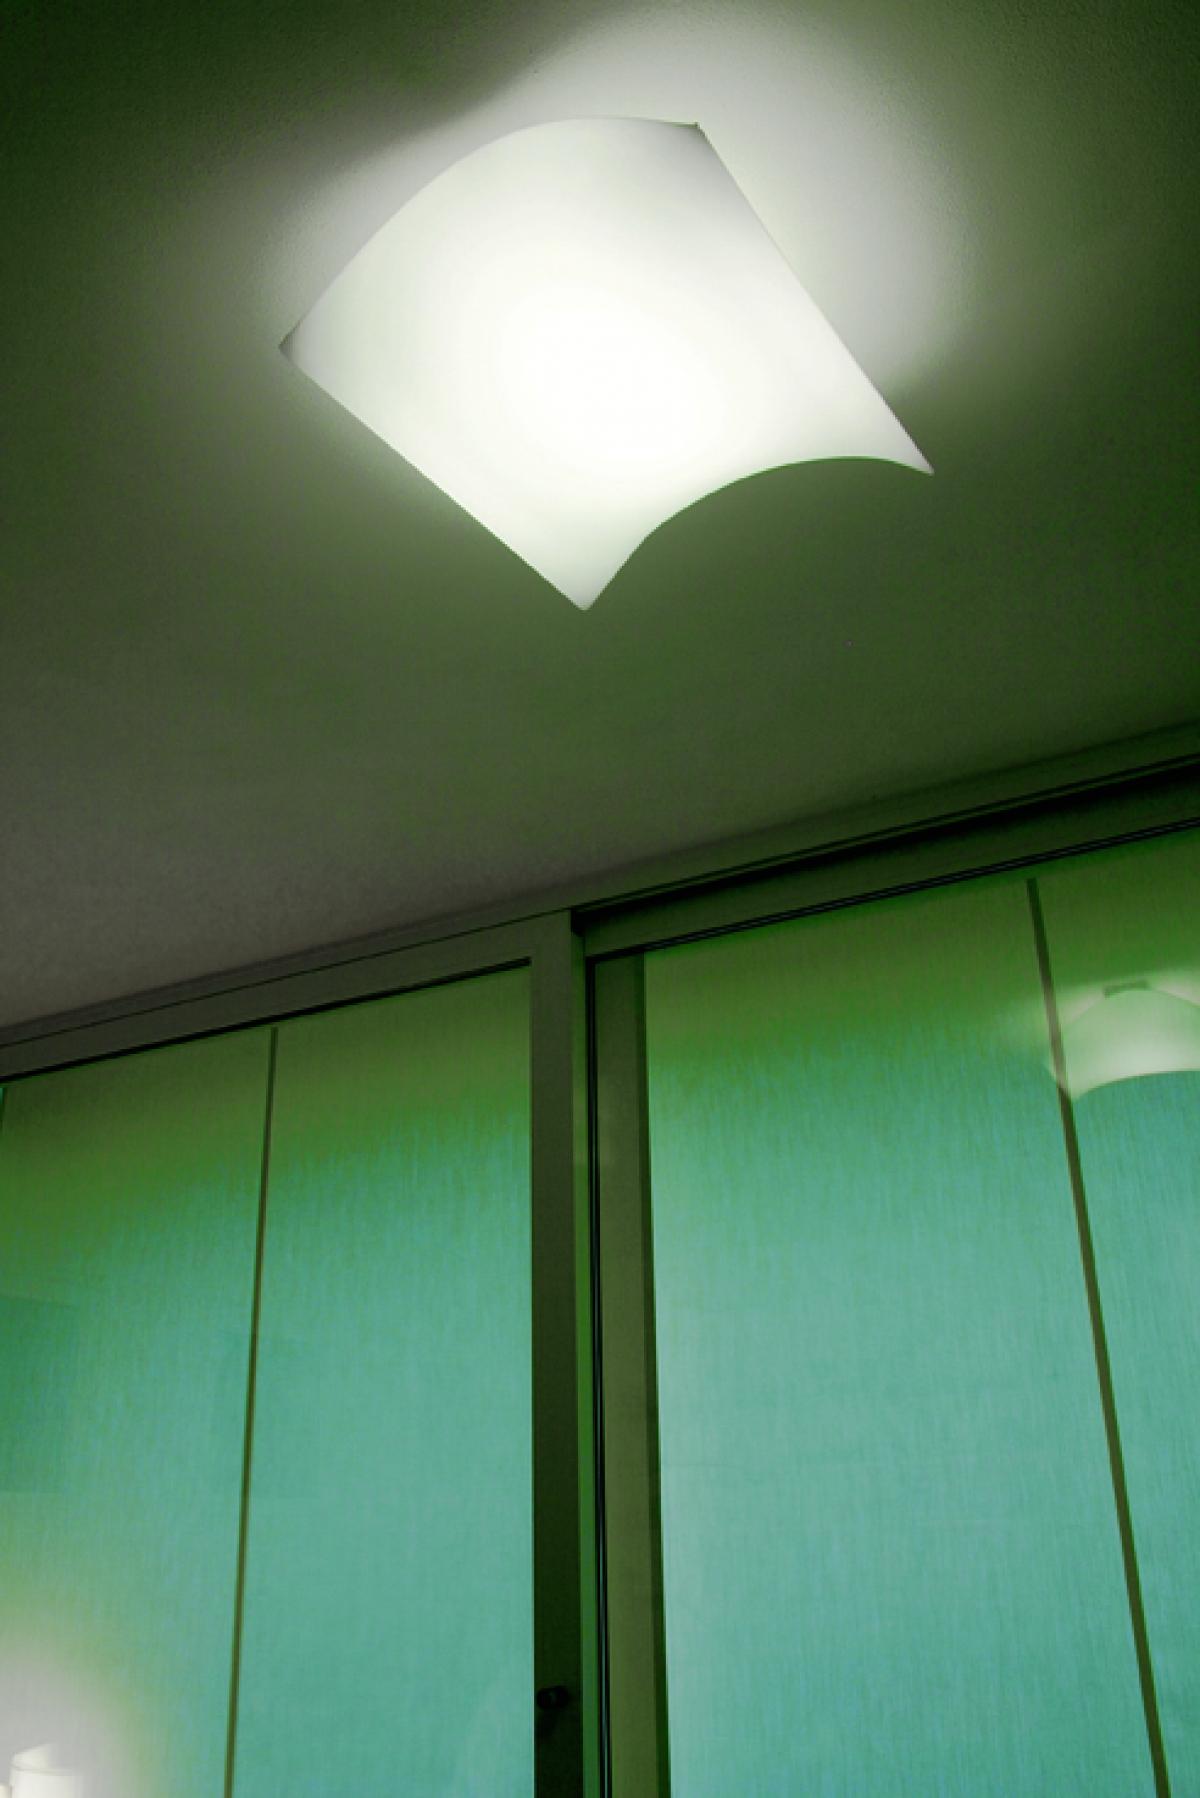 010116-101000-gal-soffittolightvolume02.jpg